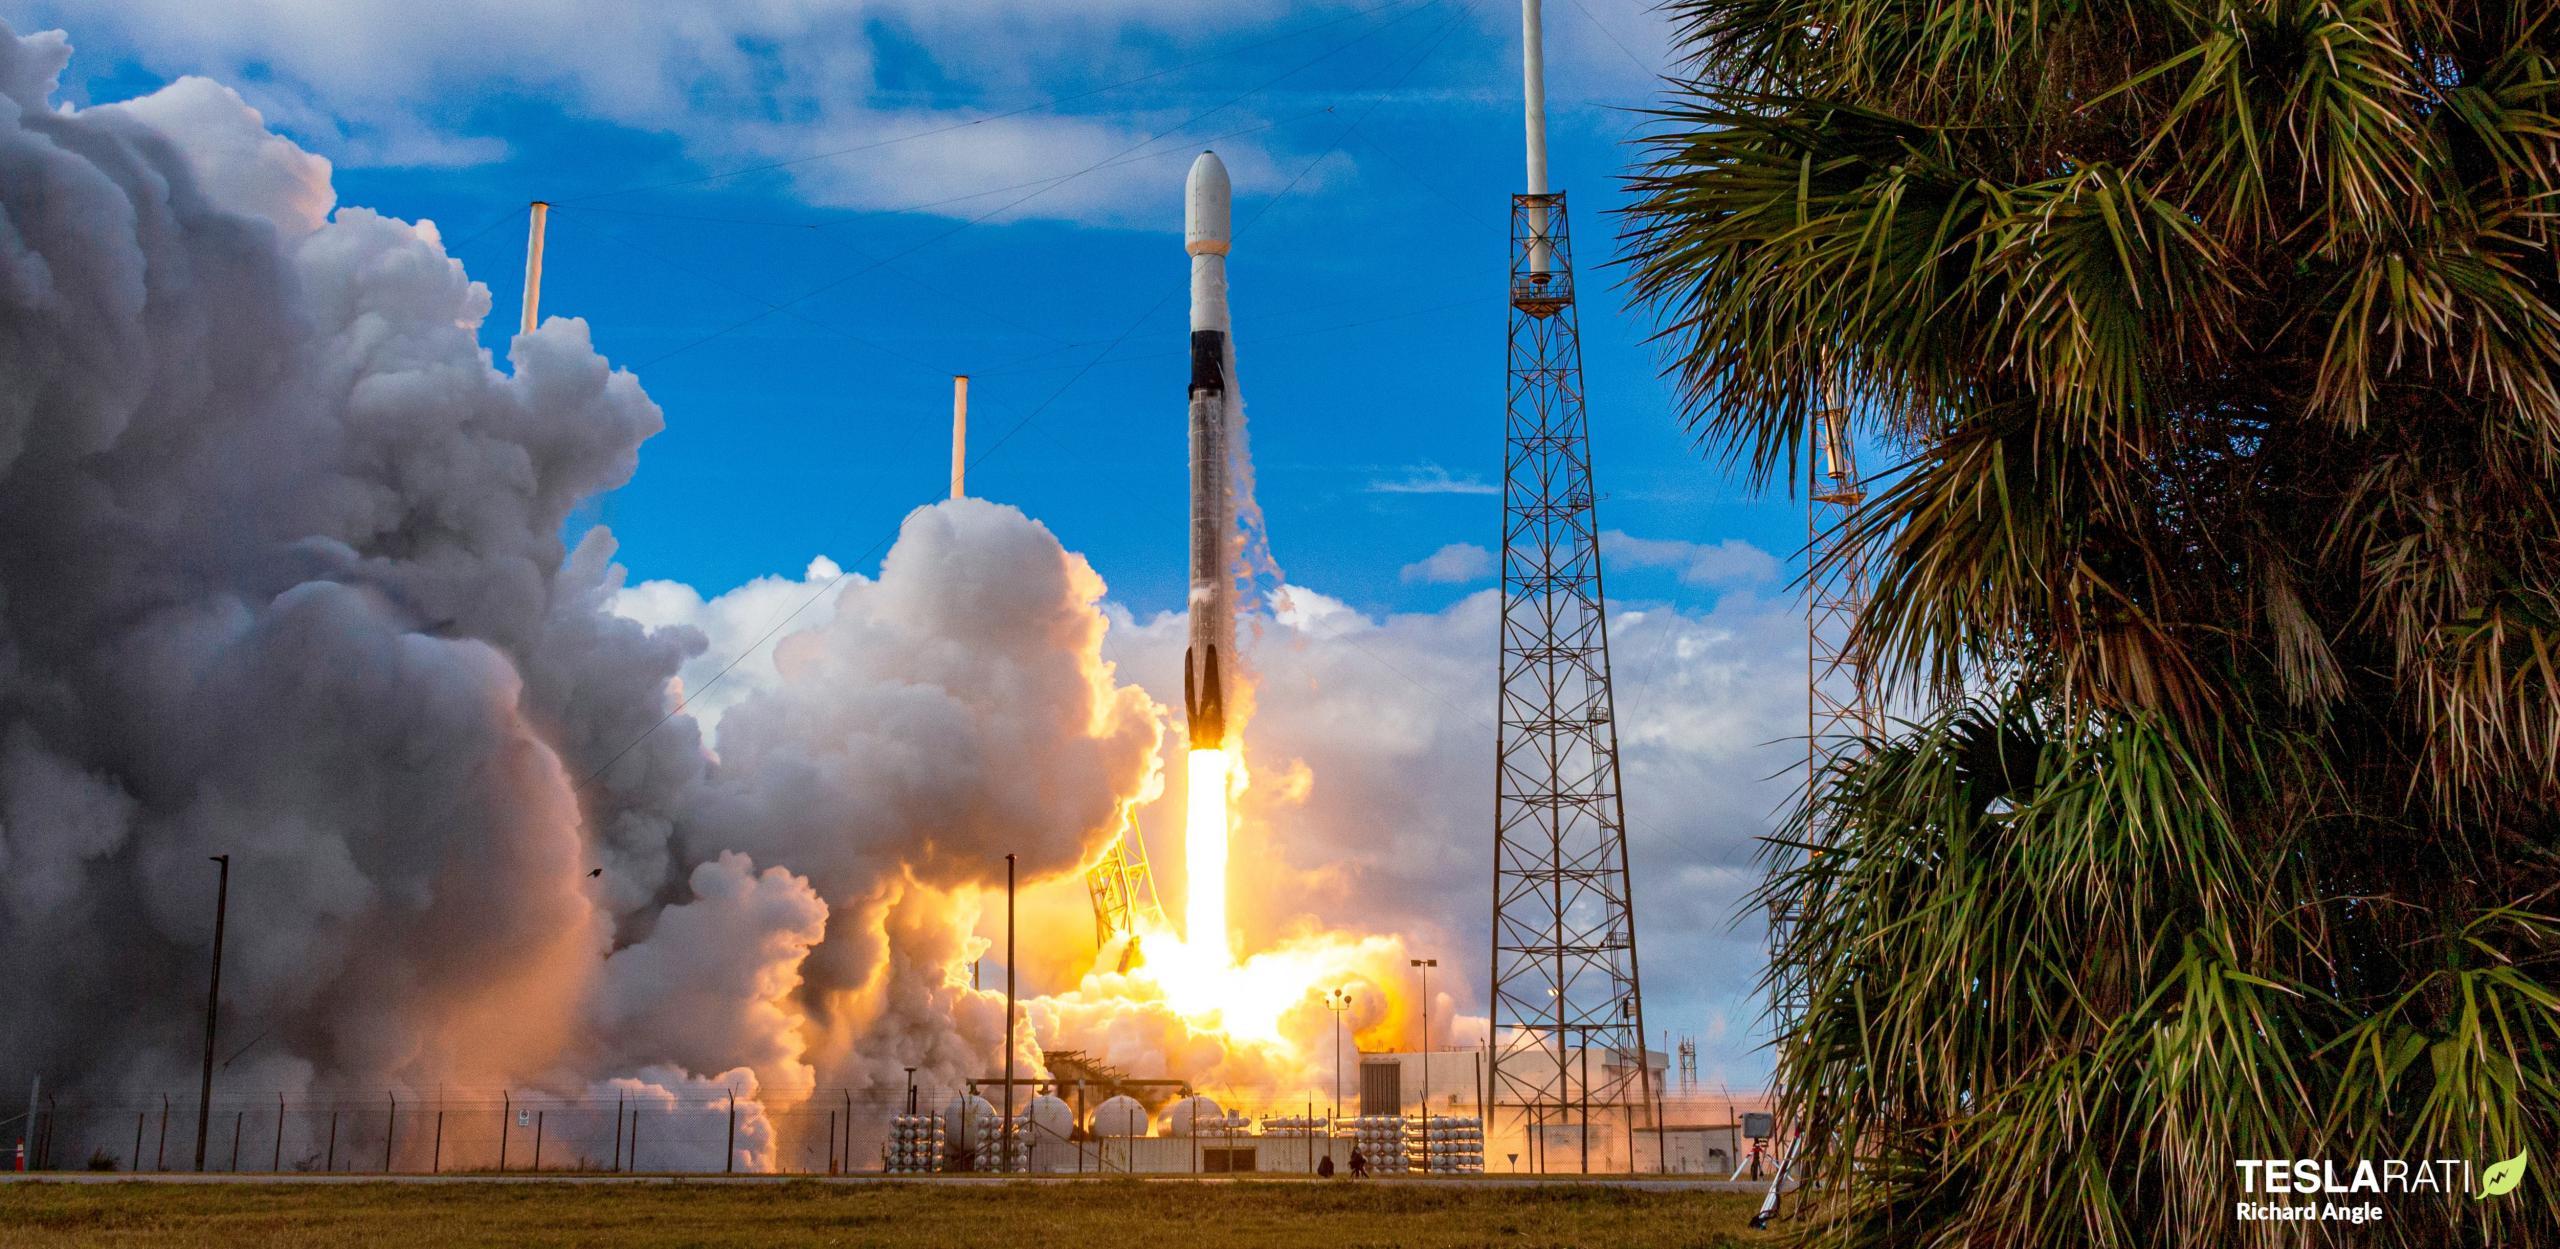 Transporter-1 Falcon 9 B1058 LC-40 012421 (Richard Angle) launch 4 crop 2 (c)